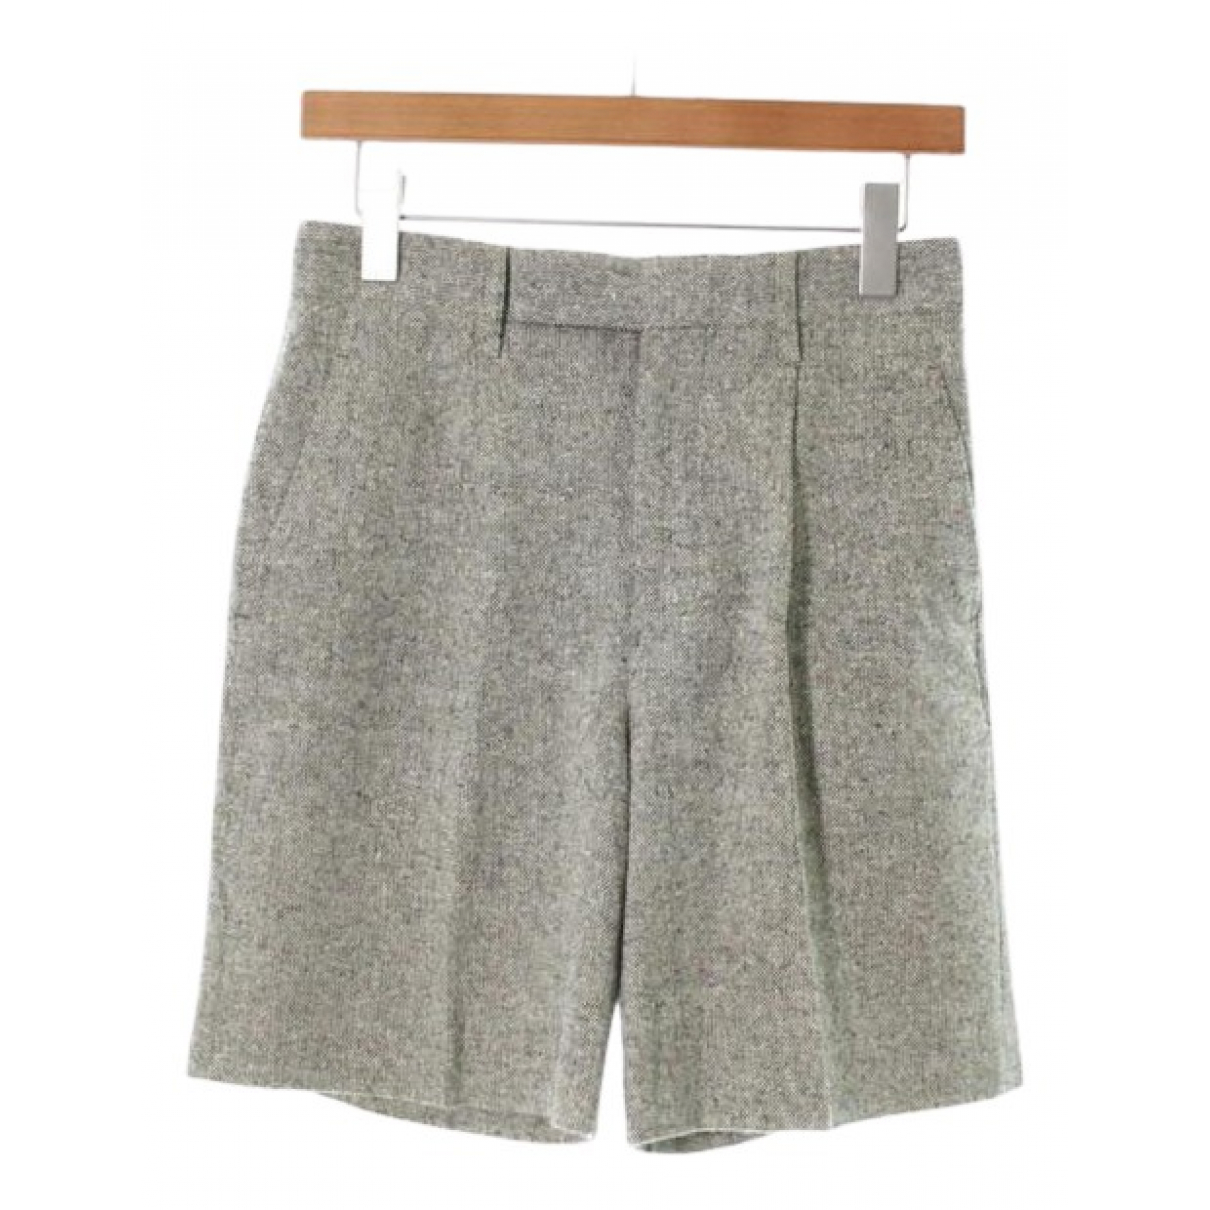 Comme Des Garcons \N Shorts in  Gruen Wolle